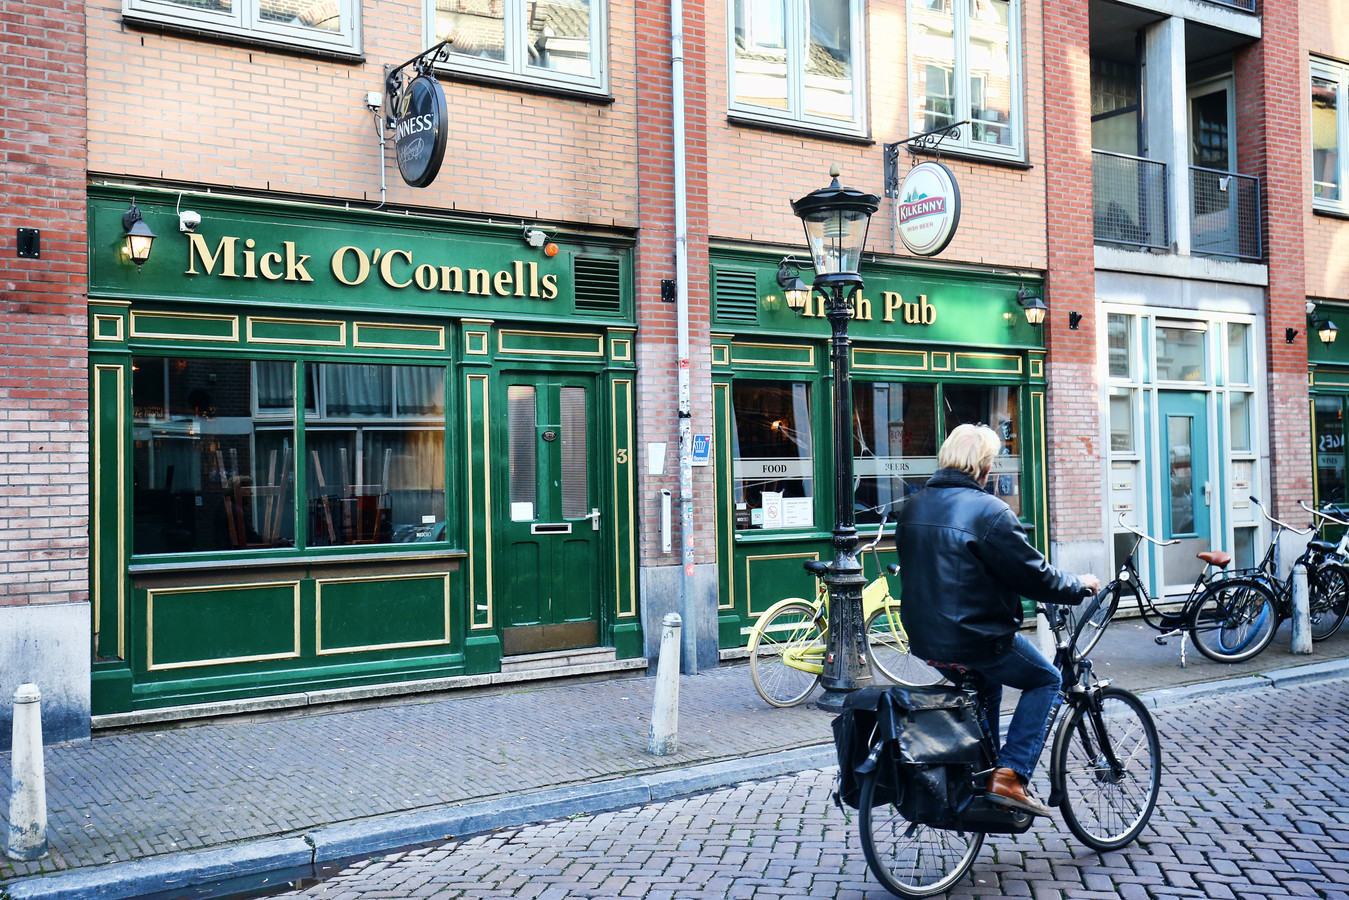 De Ierse pub Mick O'Connells aan de Jansdam in hartje Utrecht.